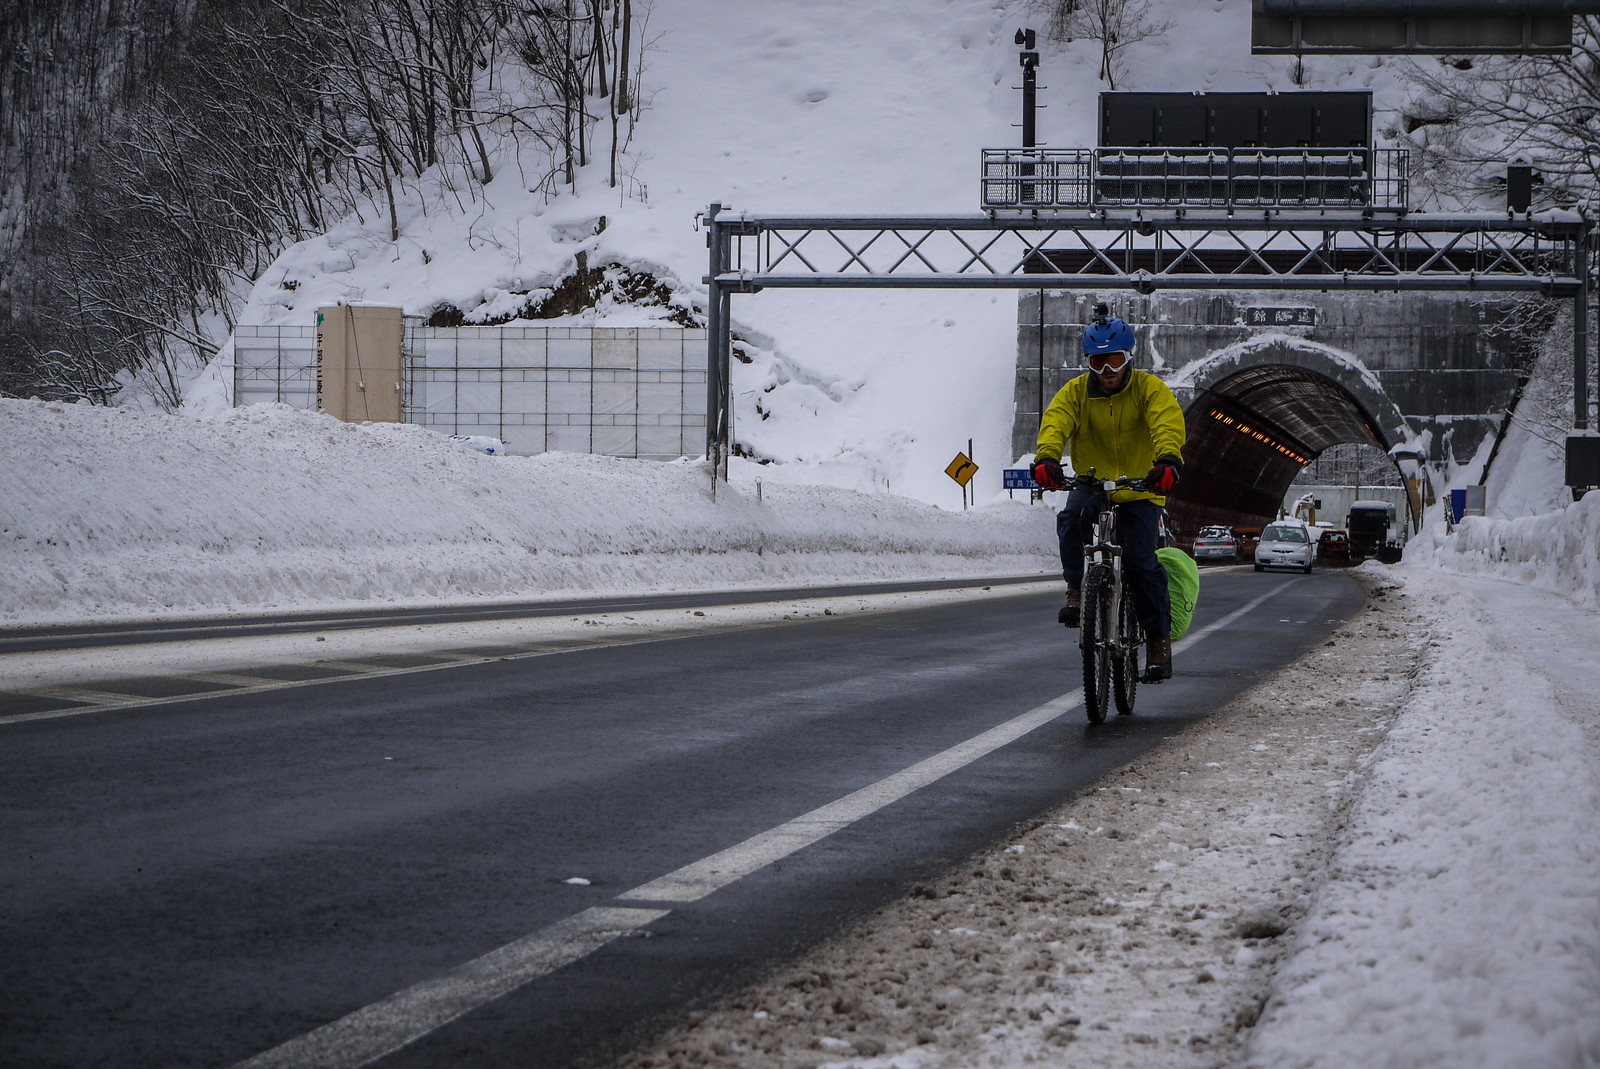 Cycling from Sapporo to Jozankei in the winter (Hokkaido, Japan)